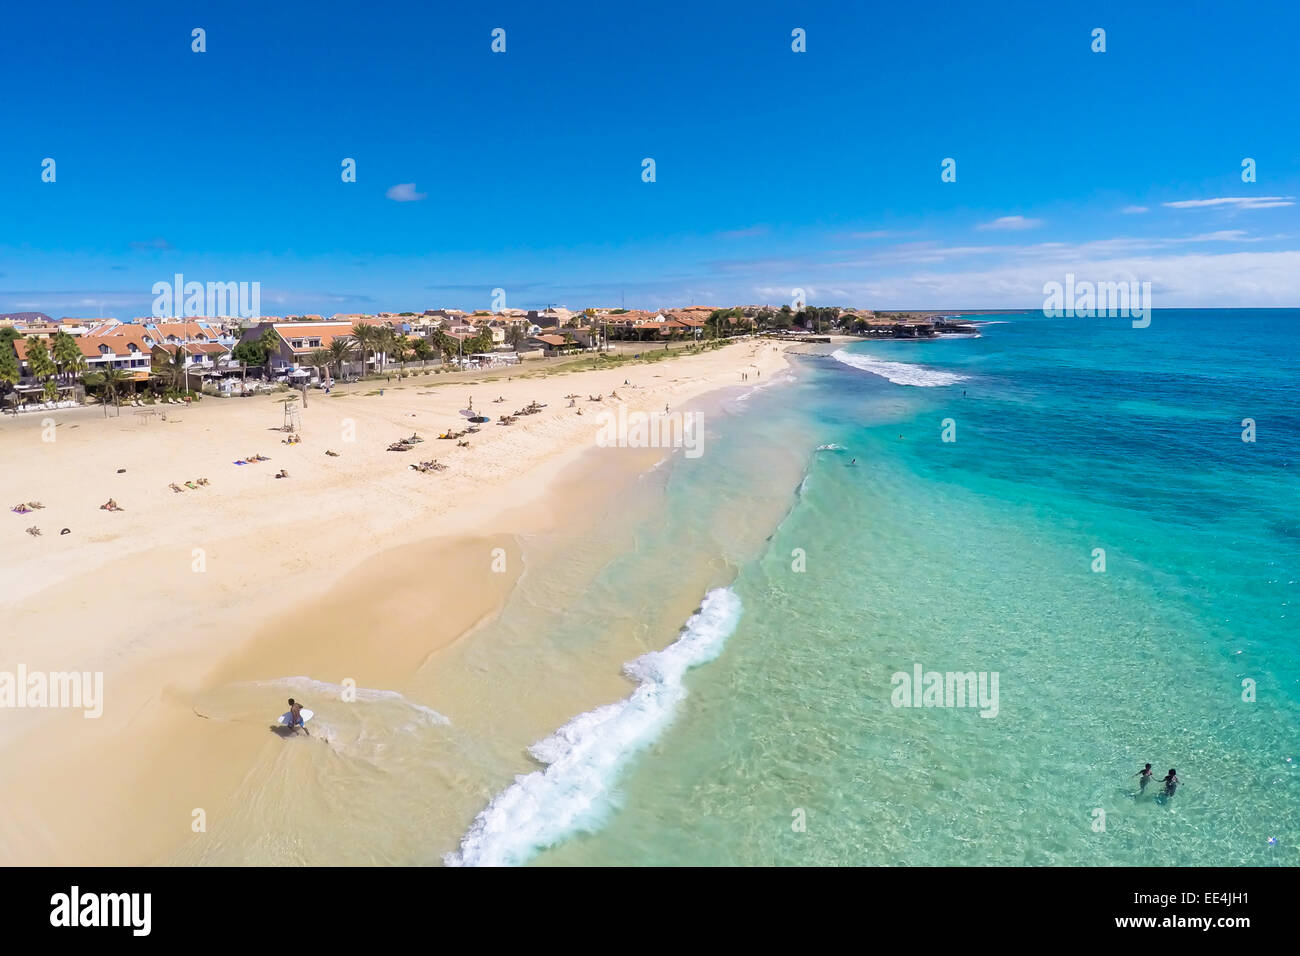 Aerial view of Santa Maria beach in Sal Cape Verde - Cabo Verde Stock Photo